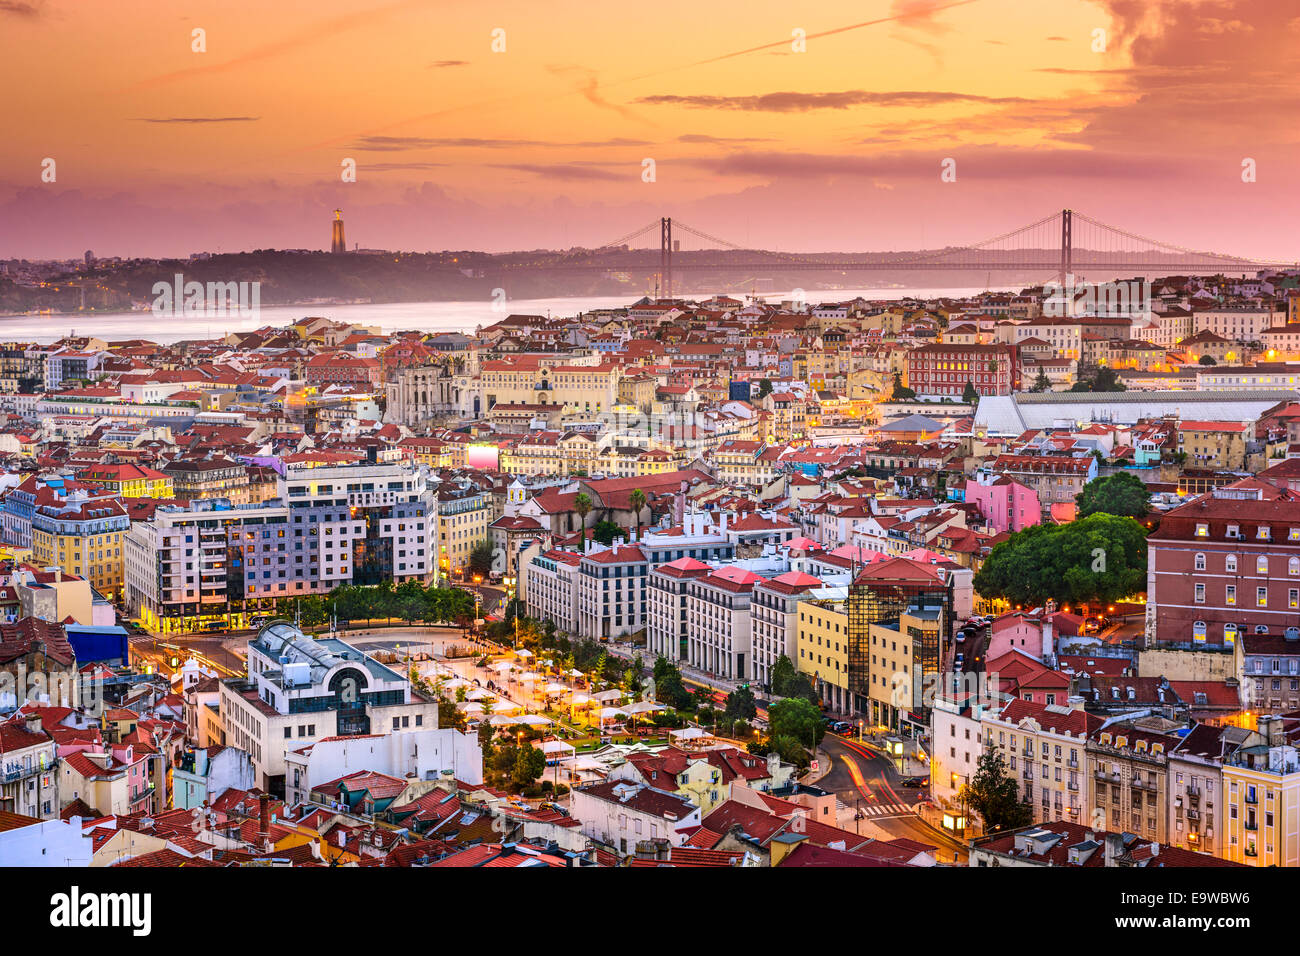 Lisbon, Portugal skyline at night. - Stock Image